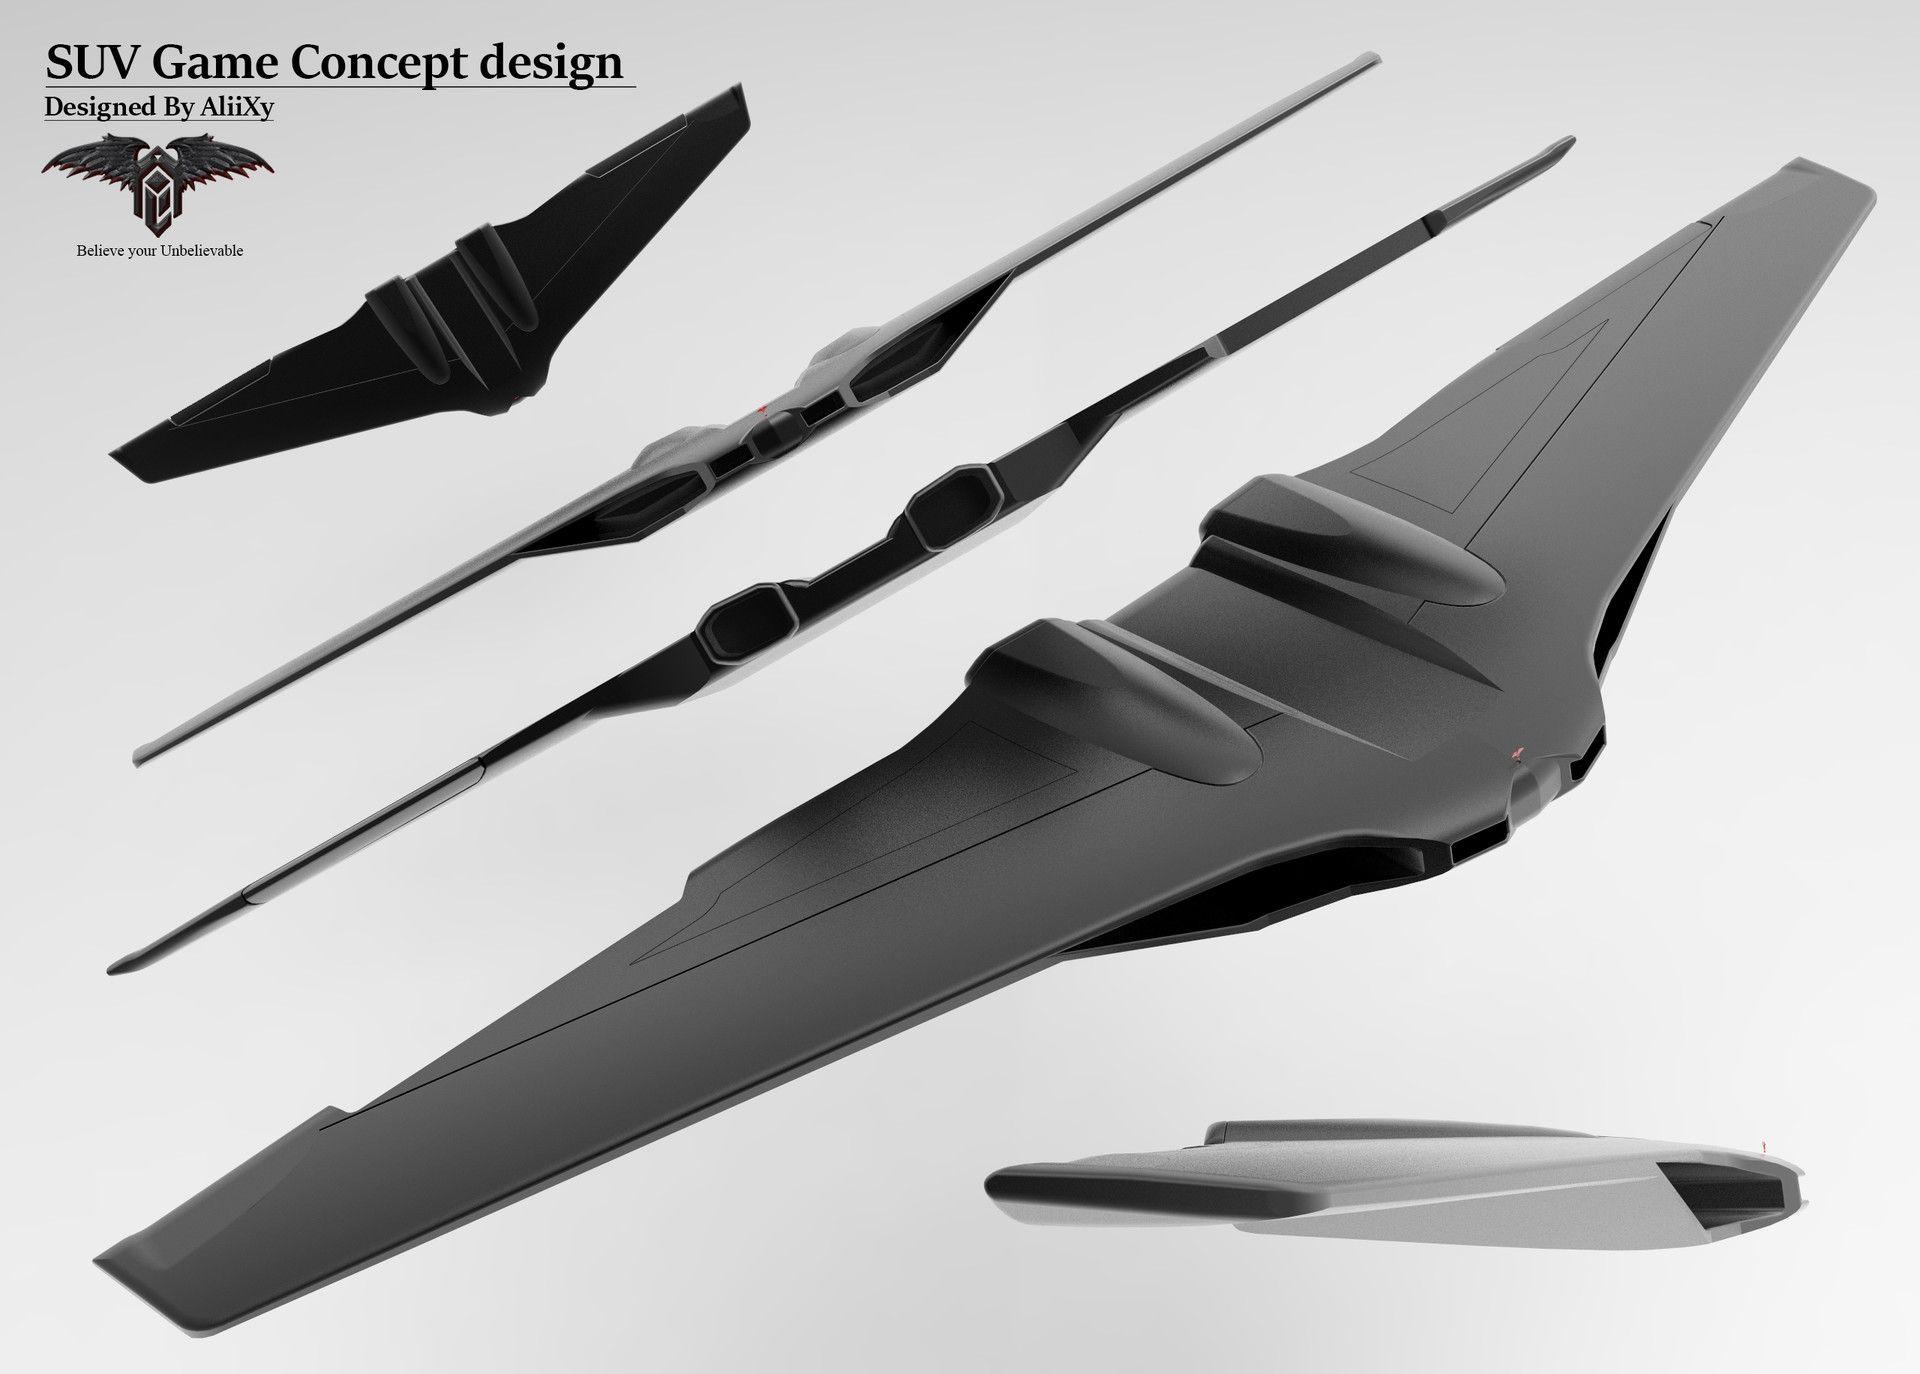 AUV concept designs